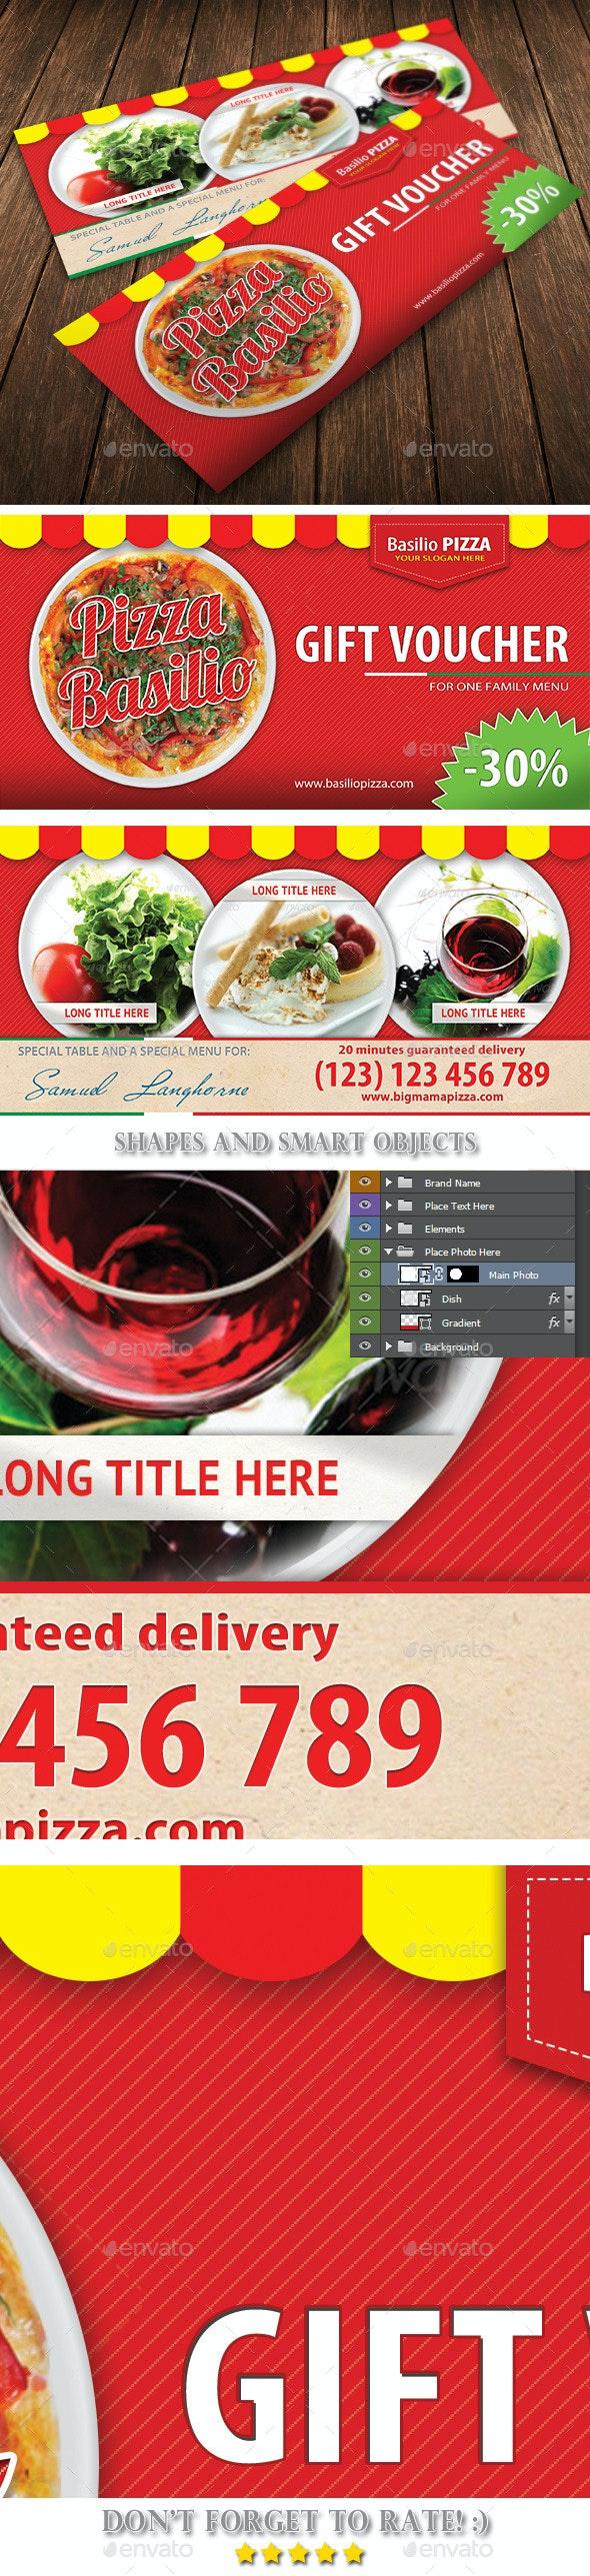 Italian Pizza Restaurant Voucher Template 31 - Cards & Invites Print Templates